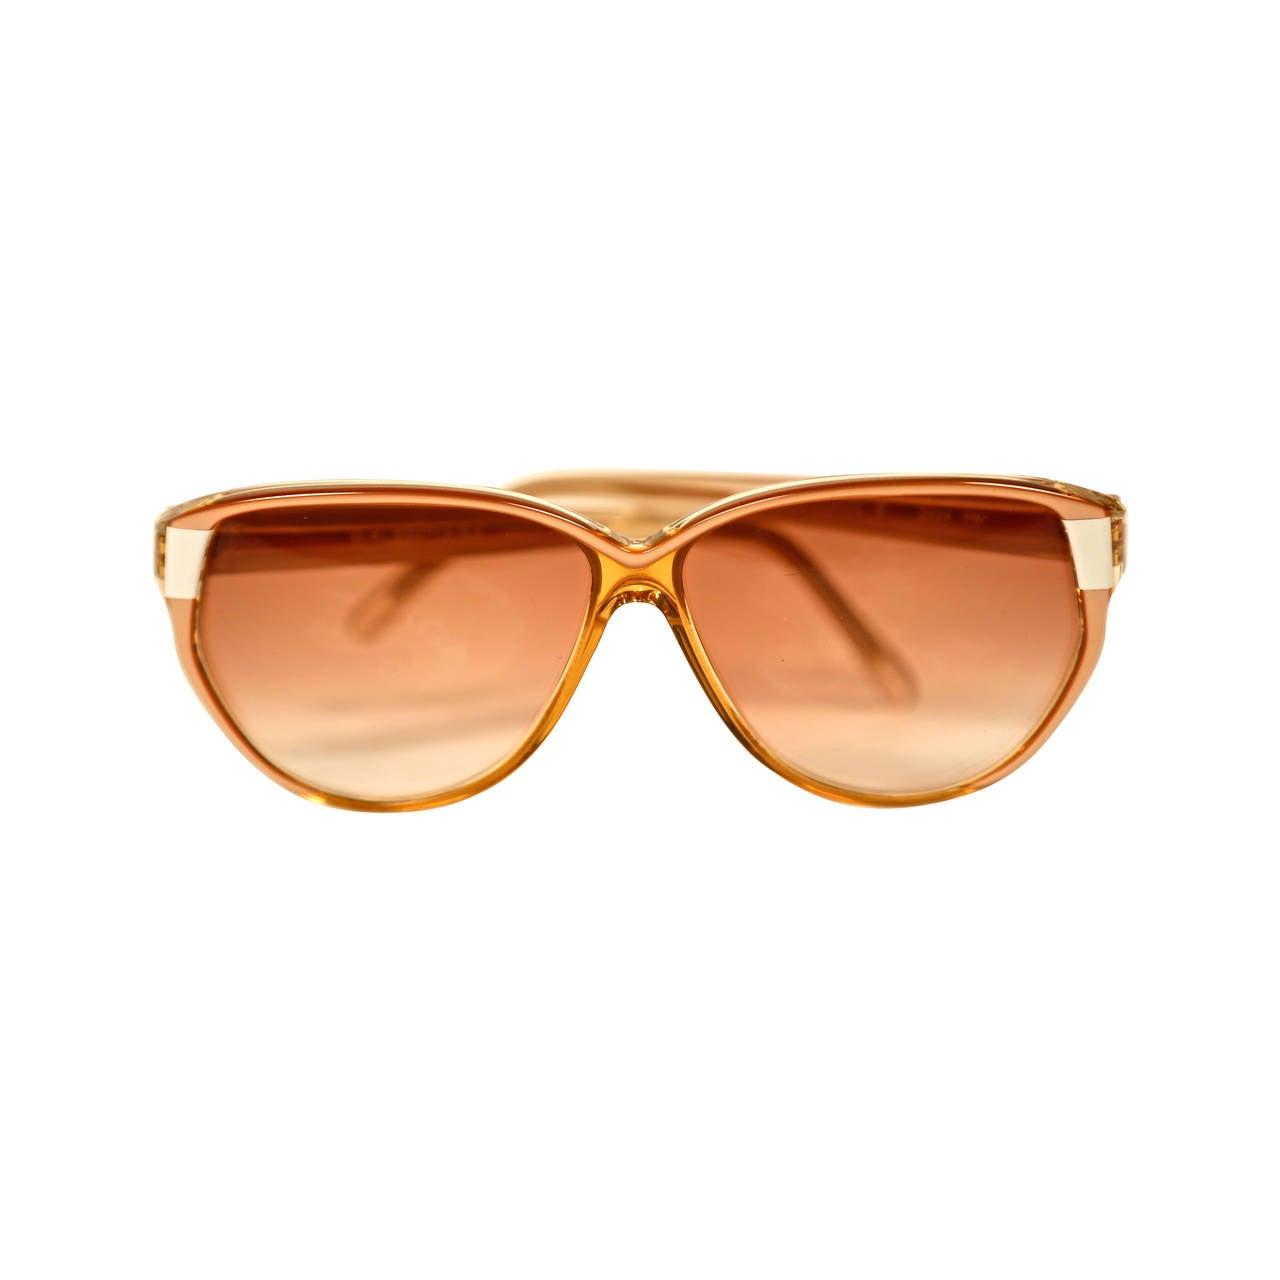 80's BALENCIAGA transparent champagne & opaque white plastic sunglasses - unworn 1